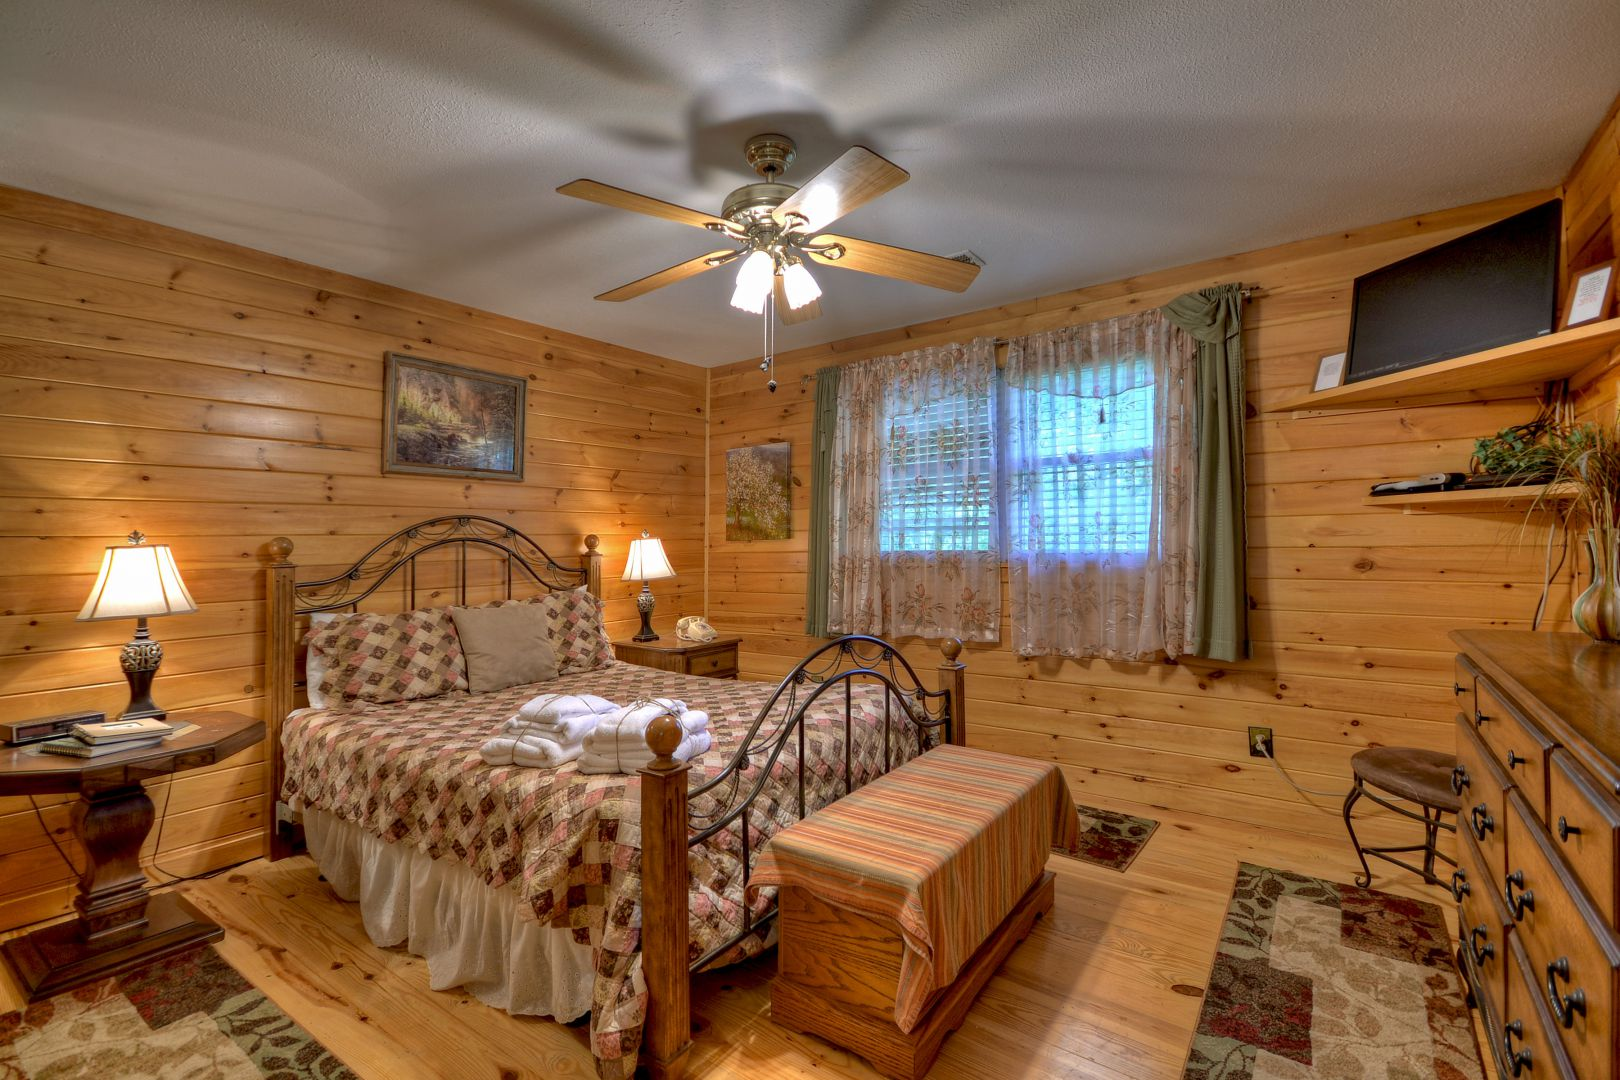 Toccoa River Escape Rental Cabin | Cuddle Up Cabin Rentals on